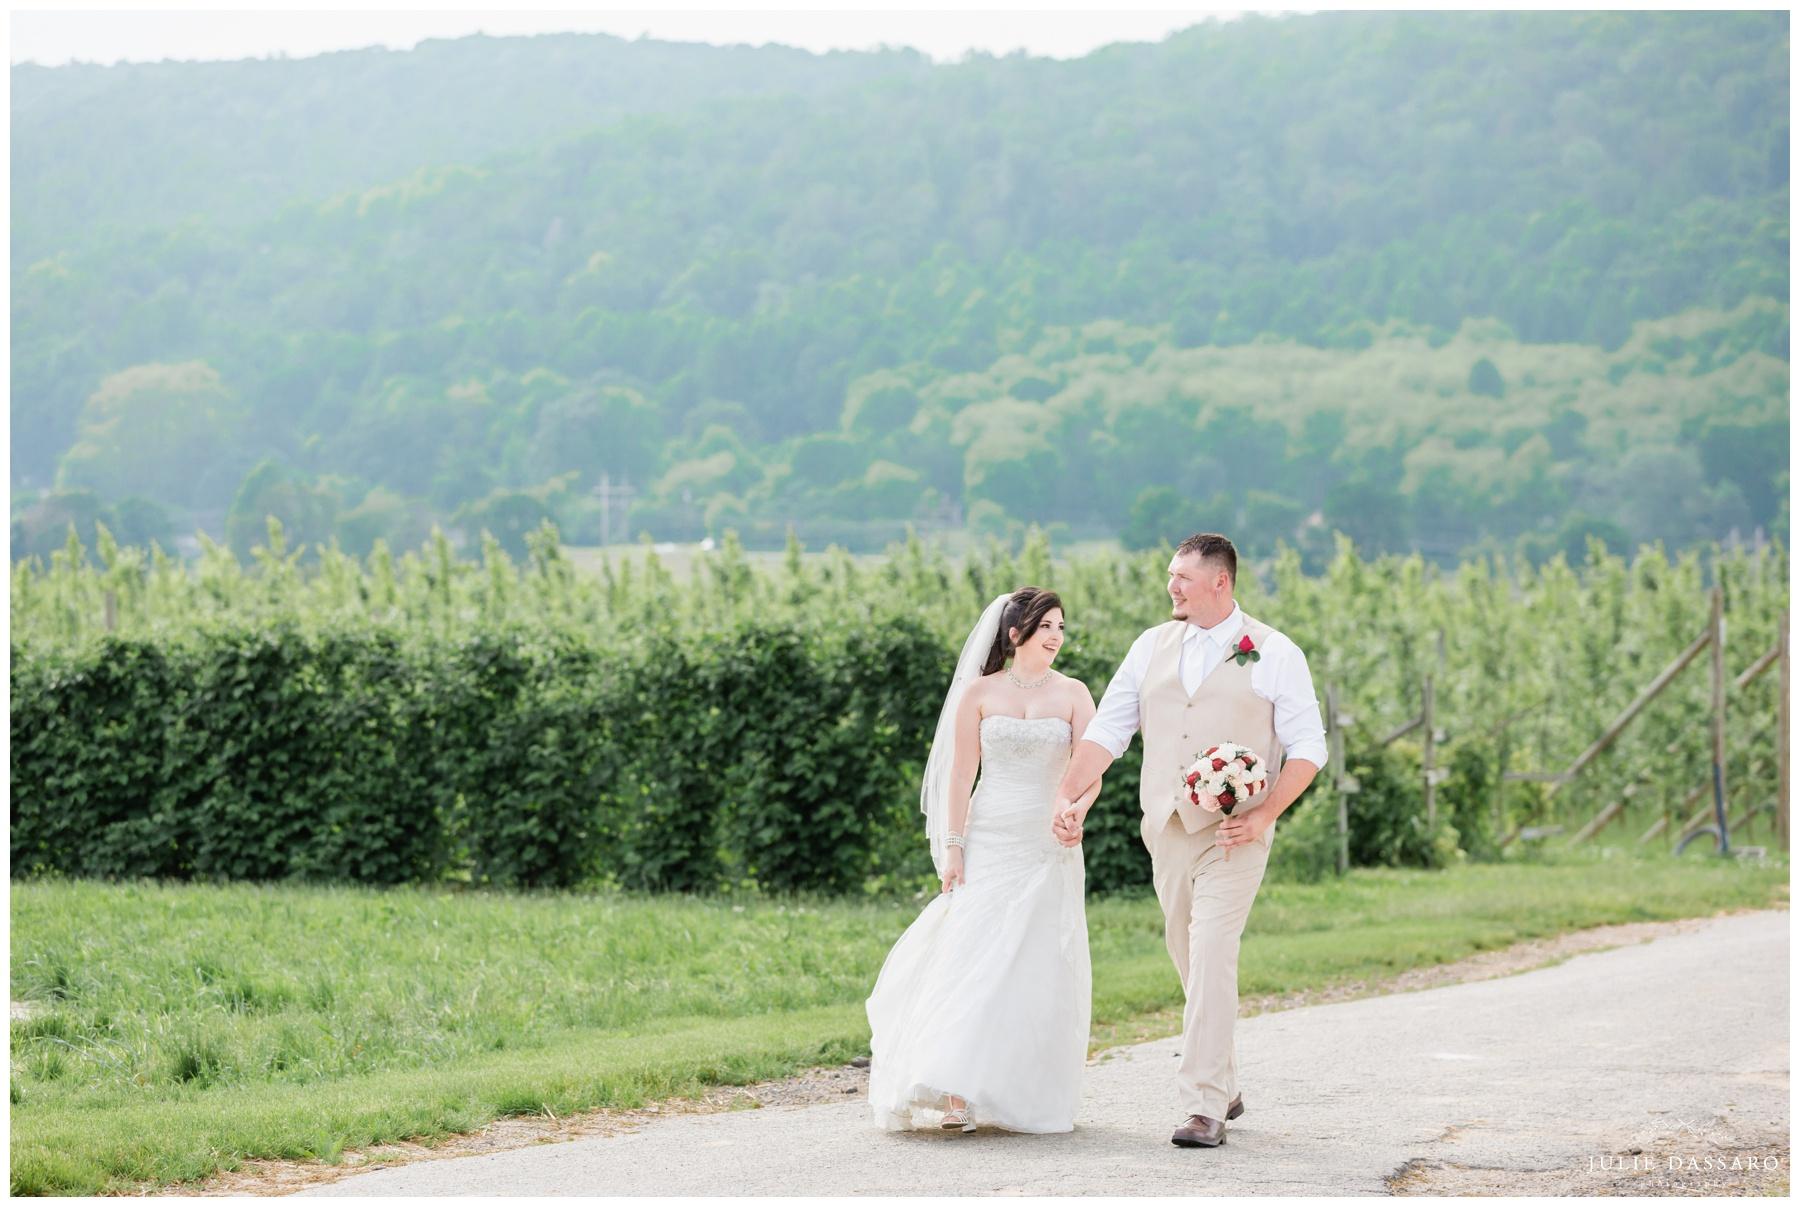 Bride and groom walking path